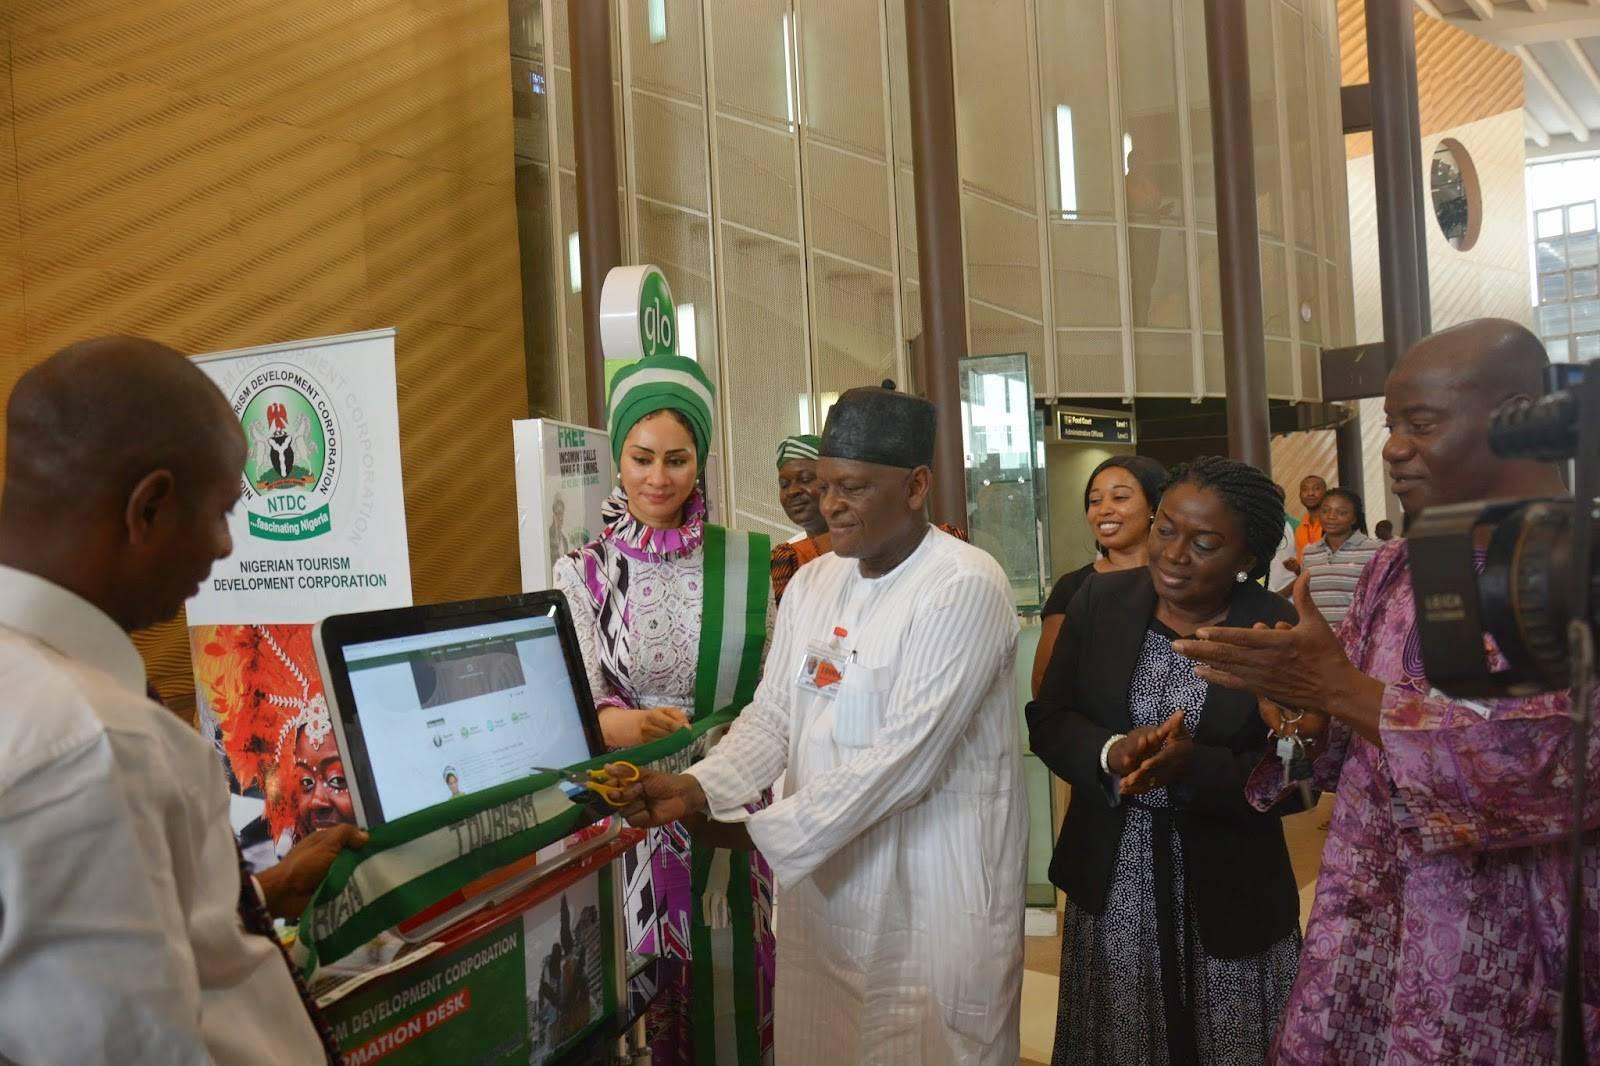 Nigerian Tourism Development Corporation, Ikeja